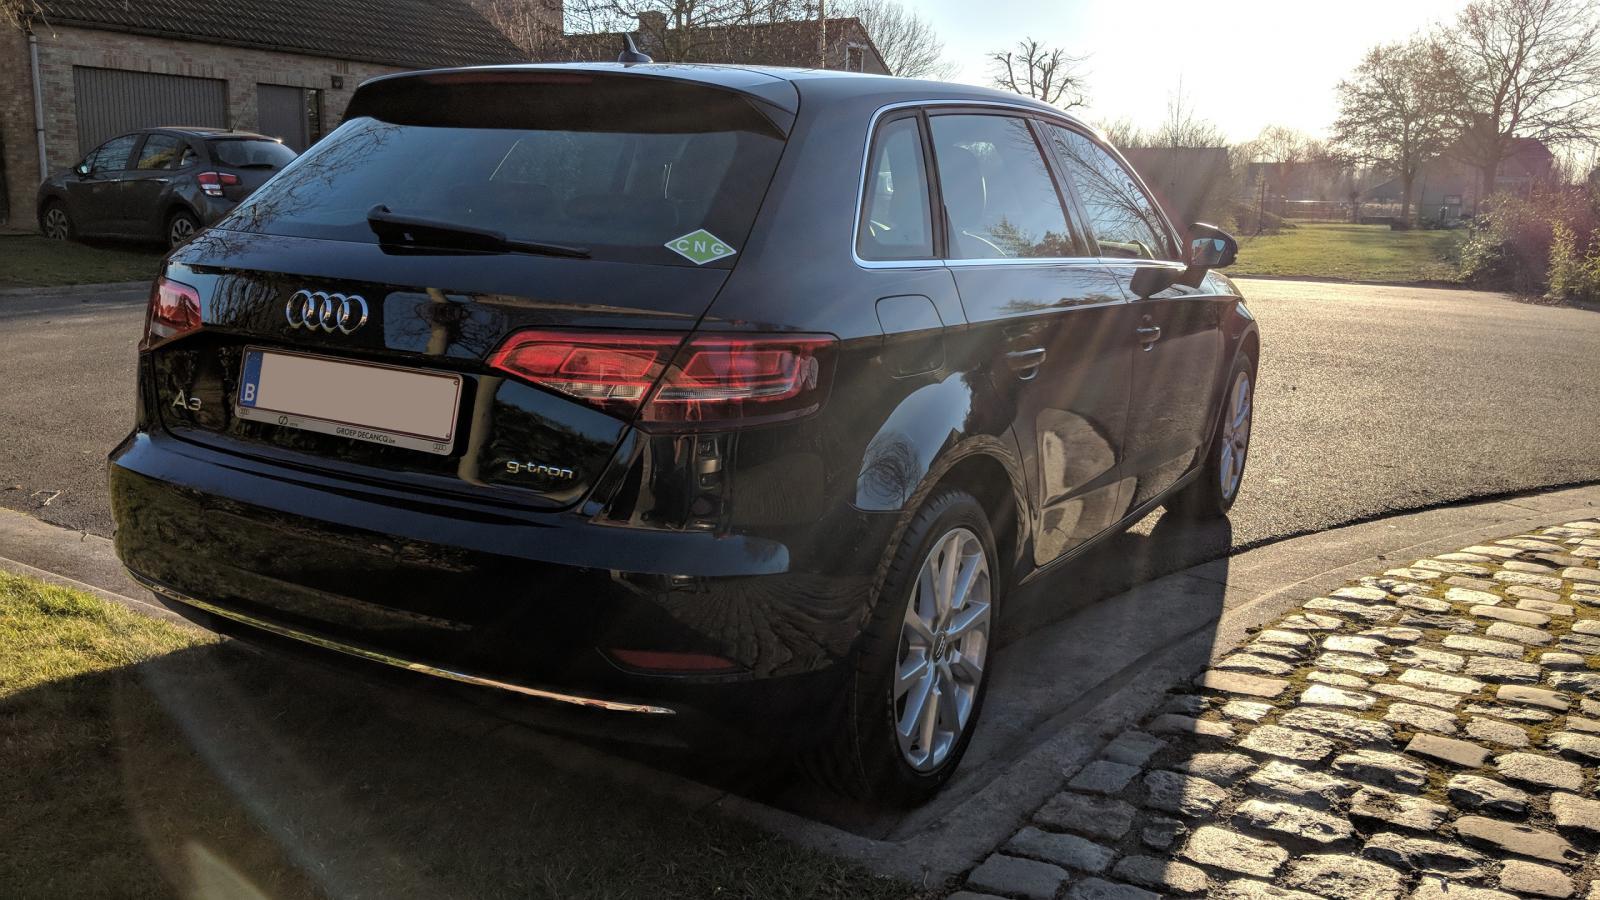 Audi A3 G-Tron van VASI91